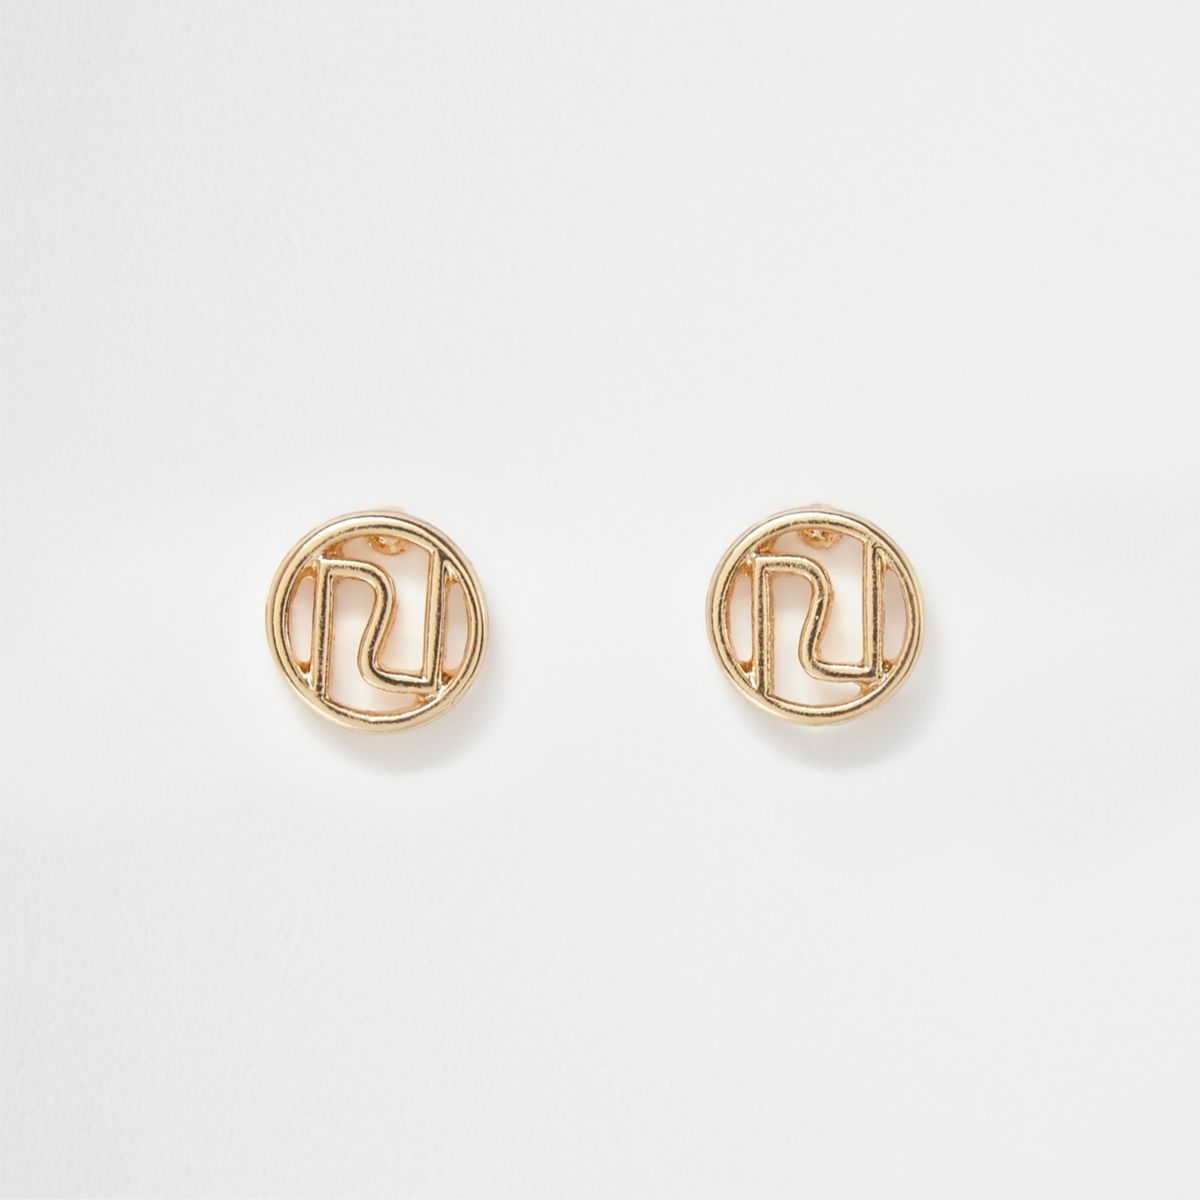 Gold tone RI stud earrings